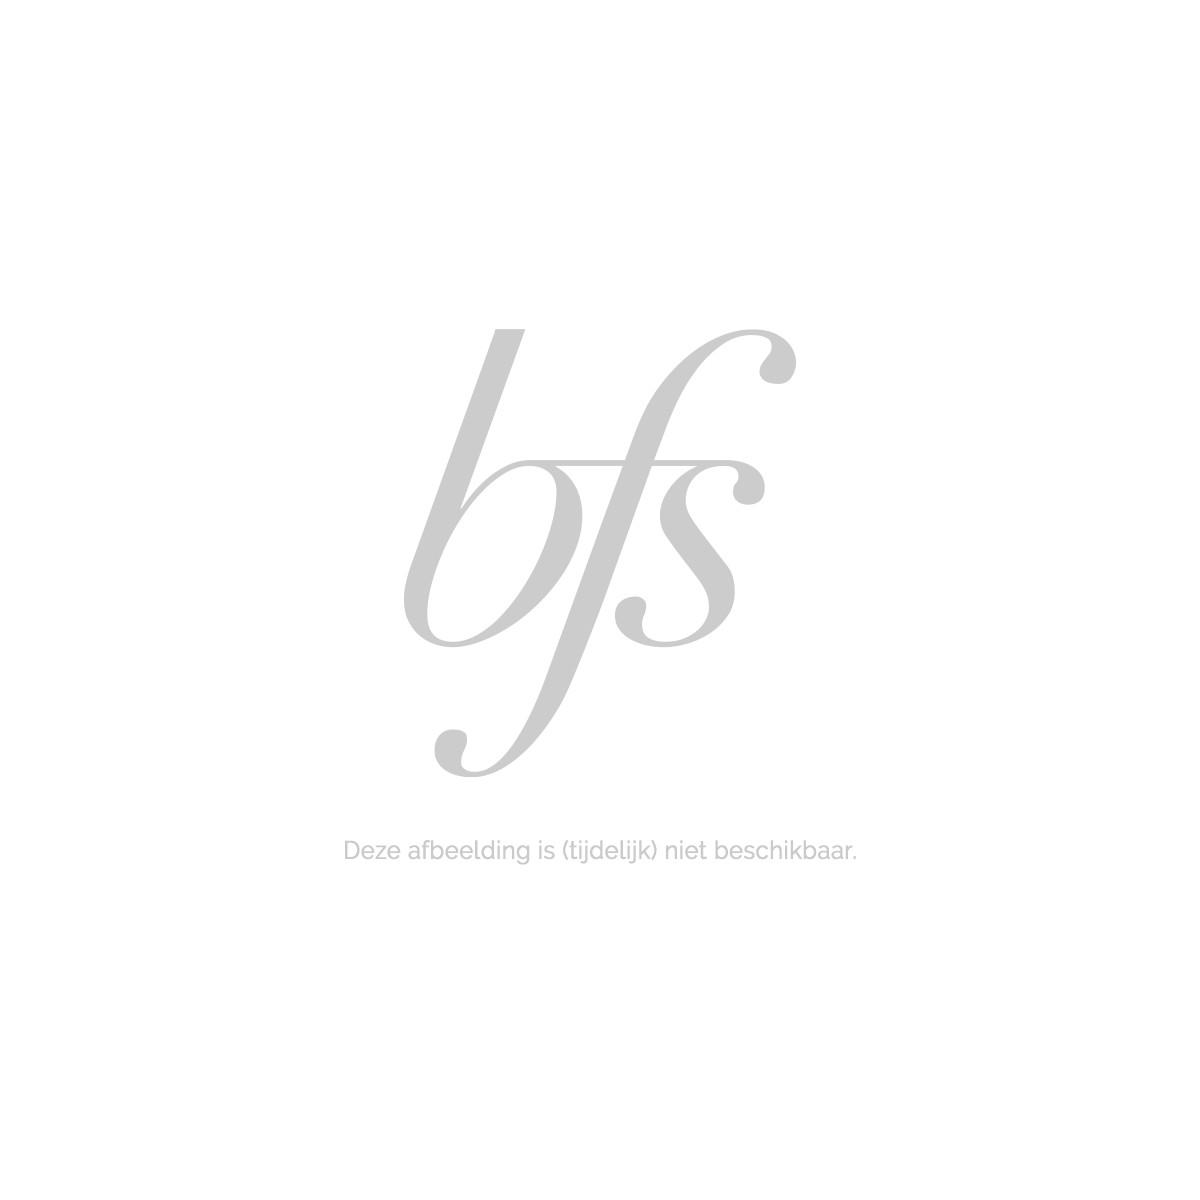 Afbeelding van Dibi Milano Elasticizing Cream For Stretch Marks Base Perfection